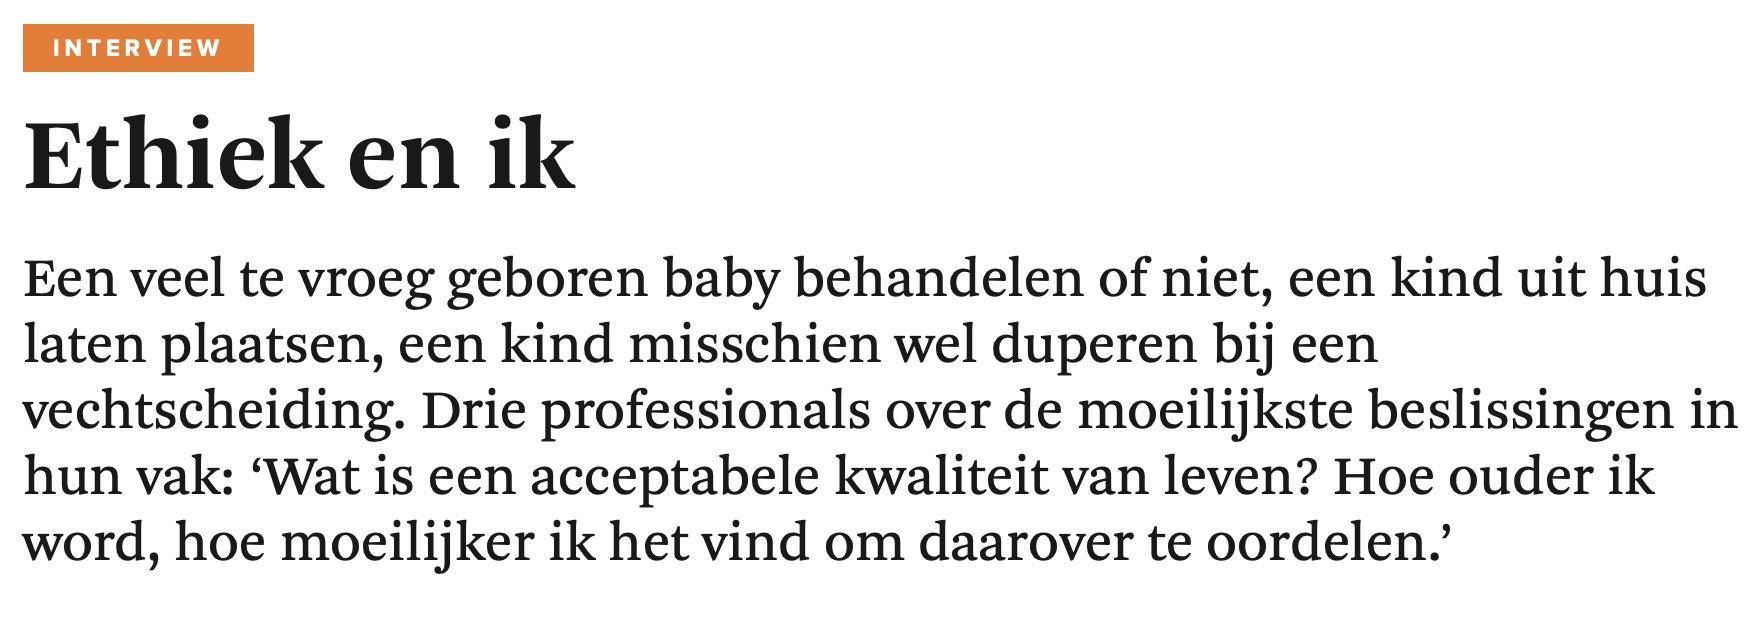 Ethiek En Ik – Fd.nl